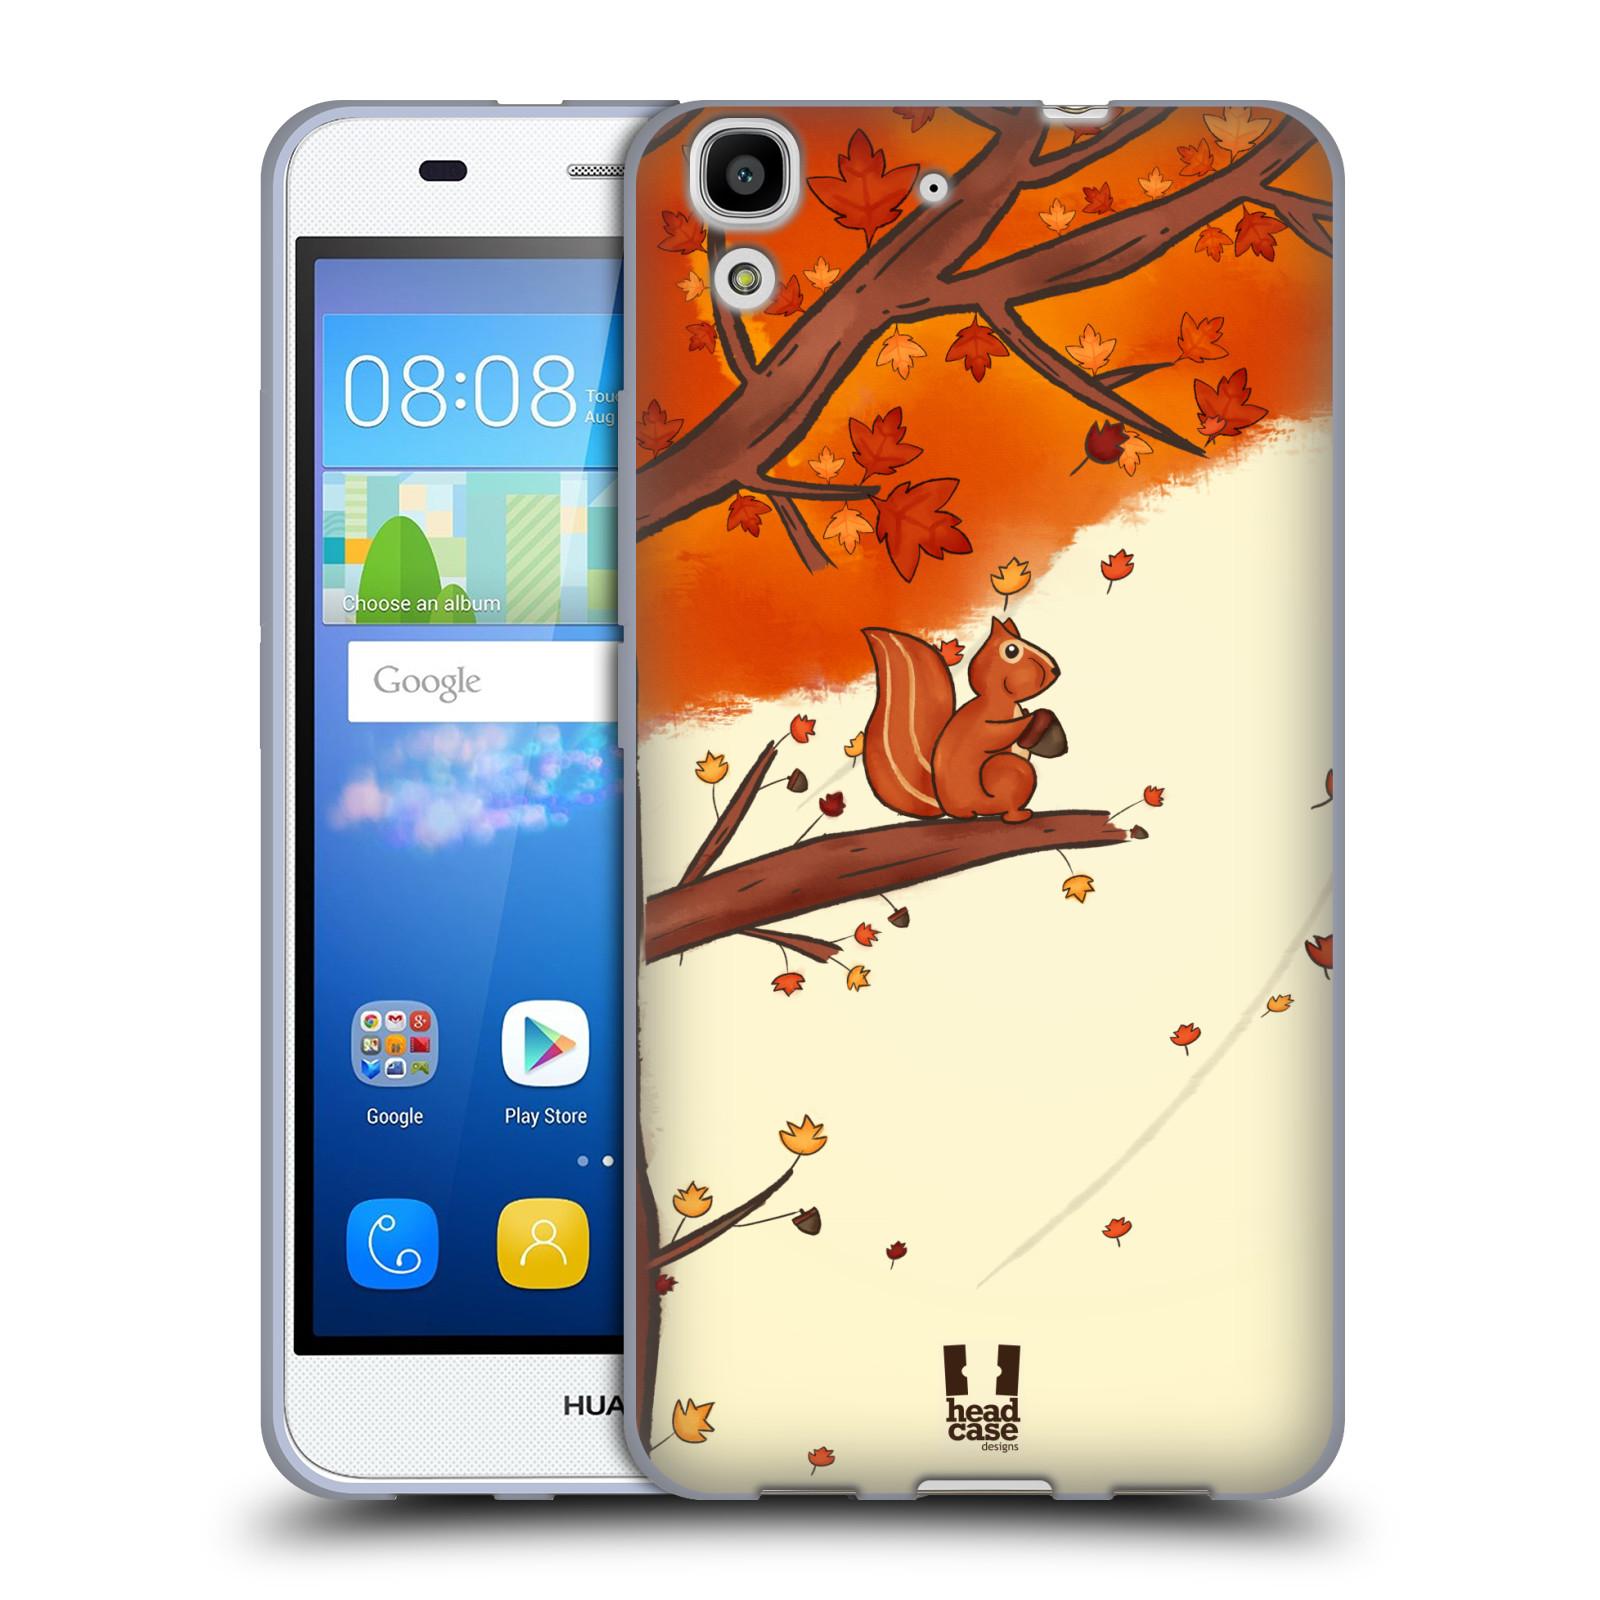 HEAD CASE silikonový obal na mobil HUAWEI Y6 vzor podzimní zvířátka veverka